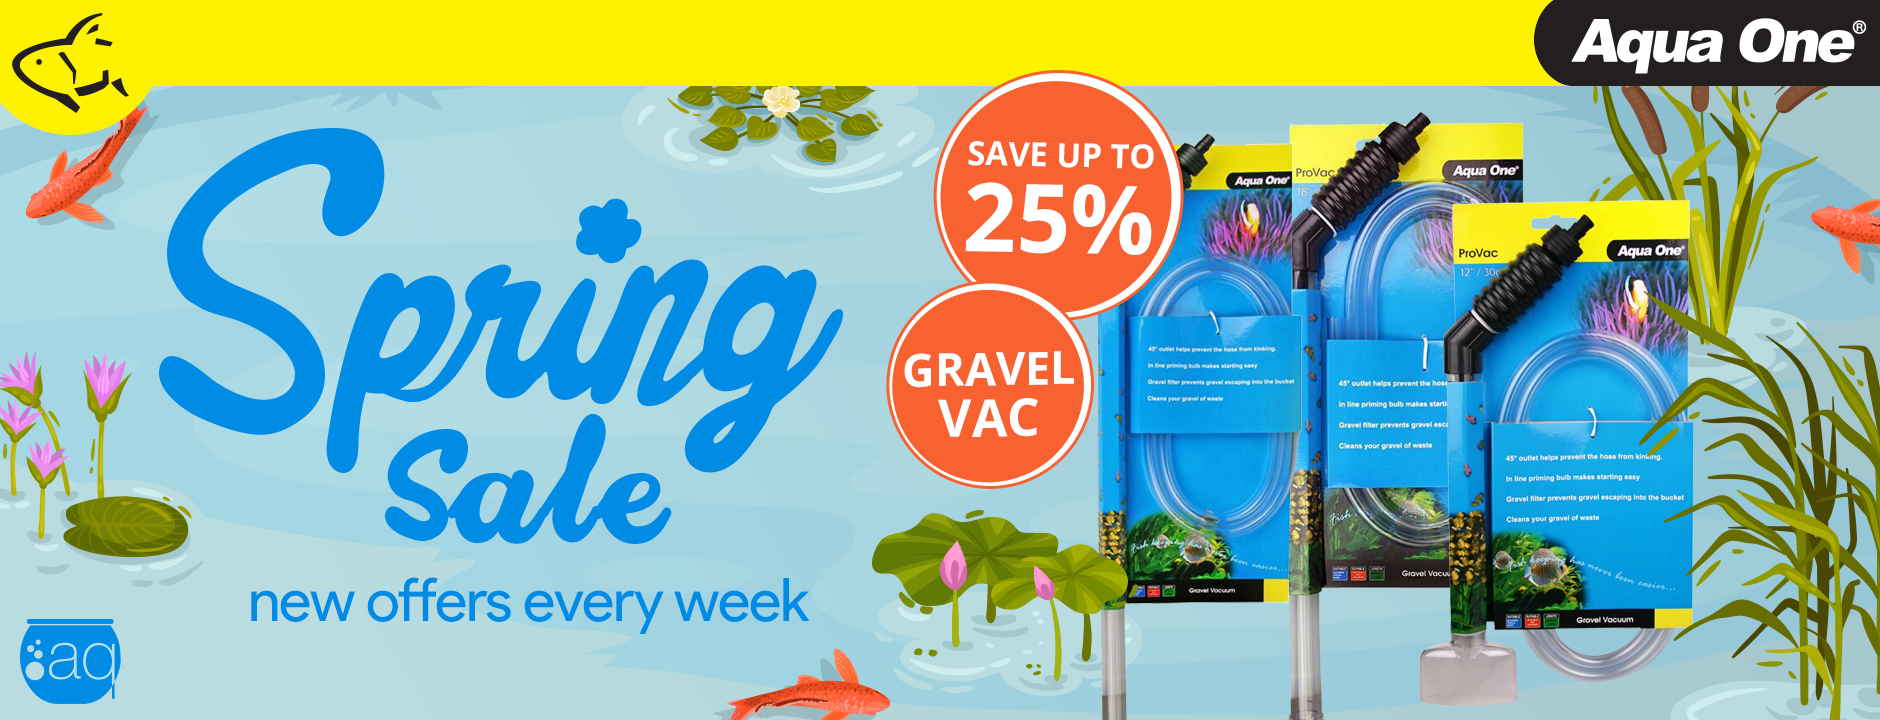 gravel-vac-offer-banner.png